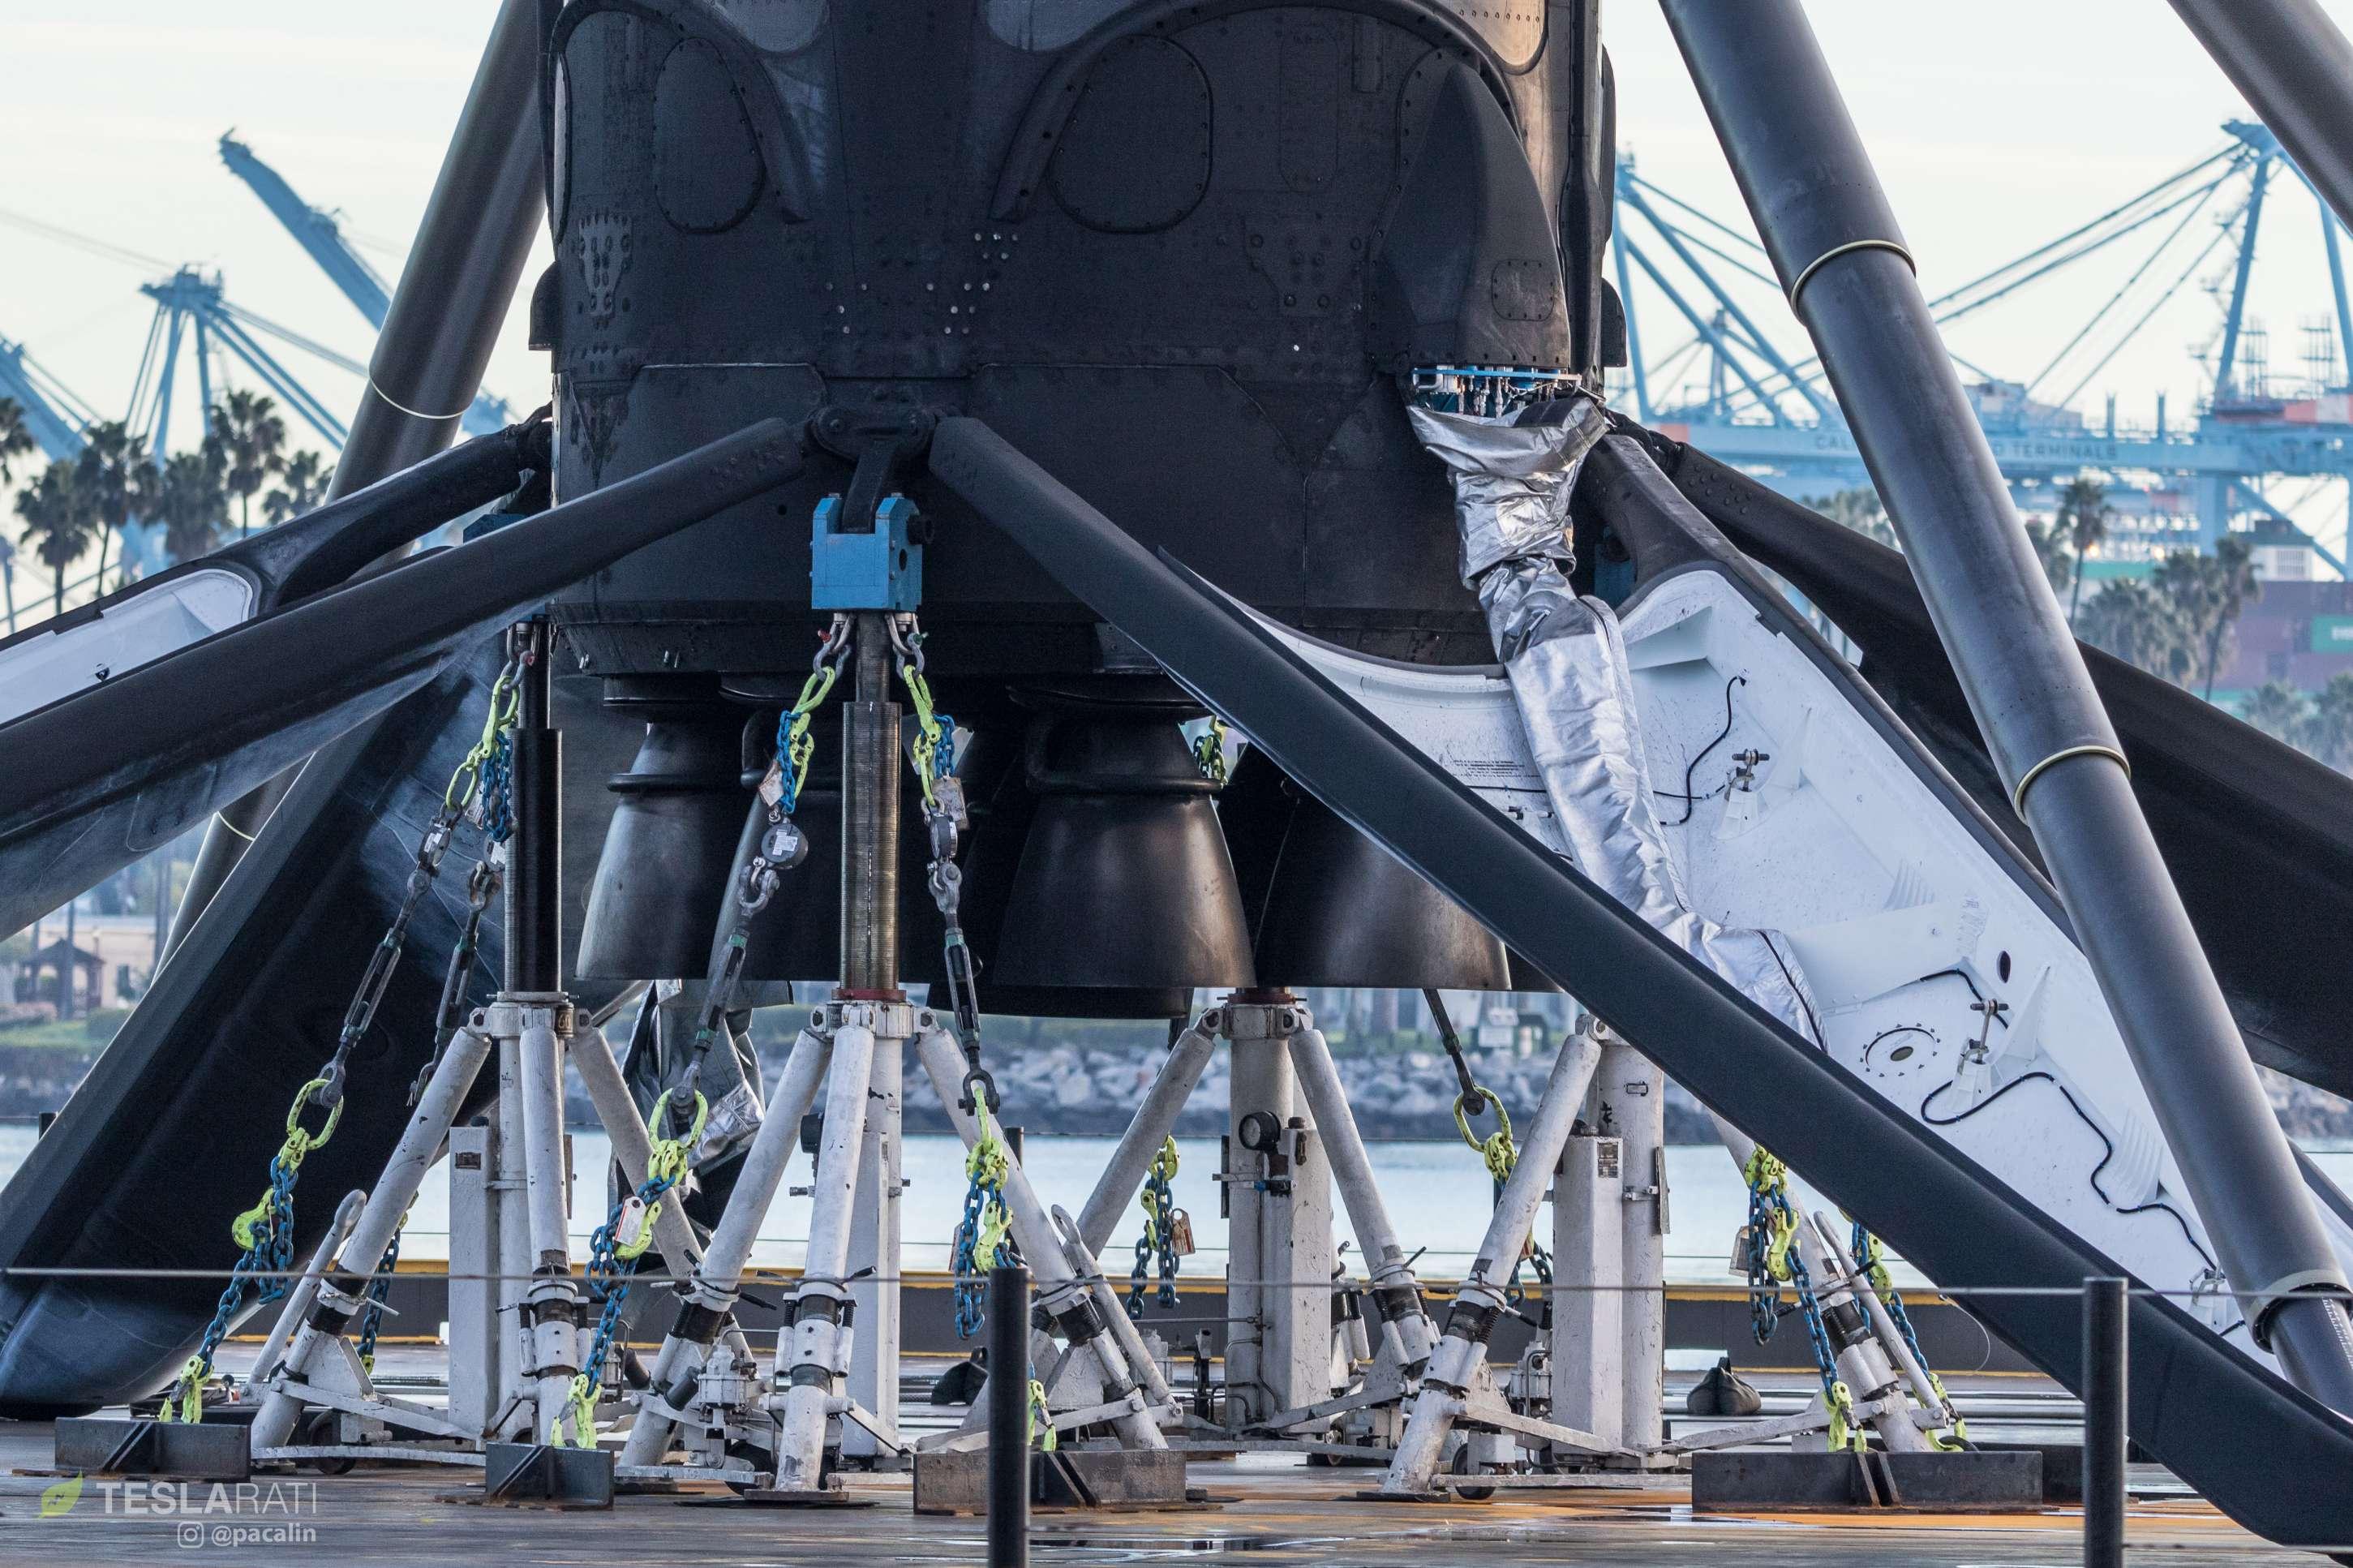 Falcon 9 B1049 Iridium-8 dawn return 011318 (Pauline Acalin) detail 2(c)